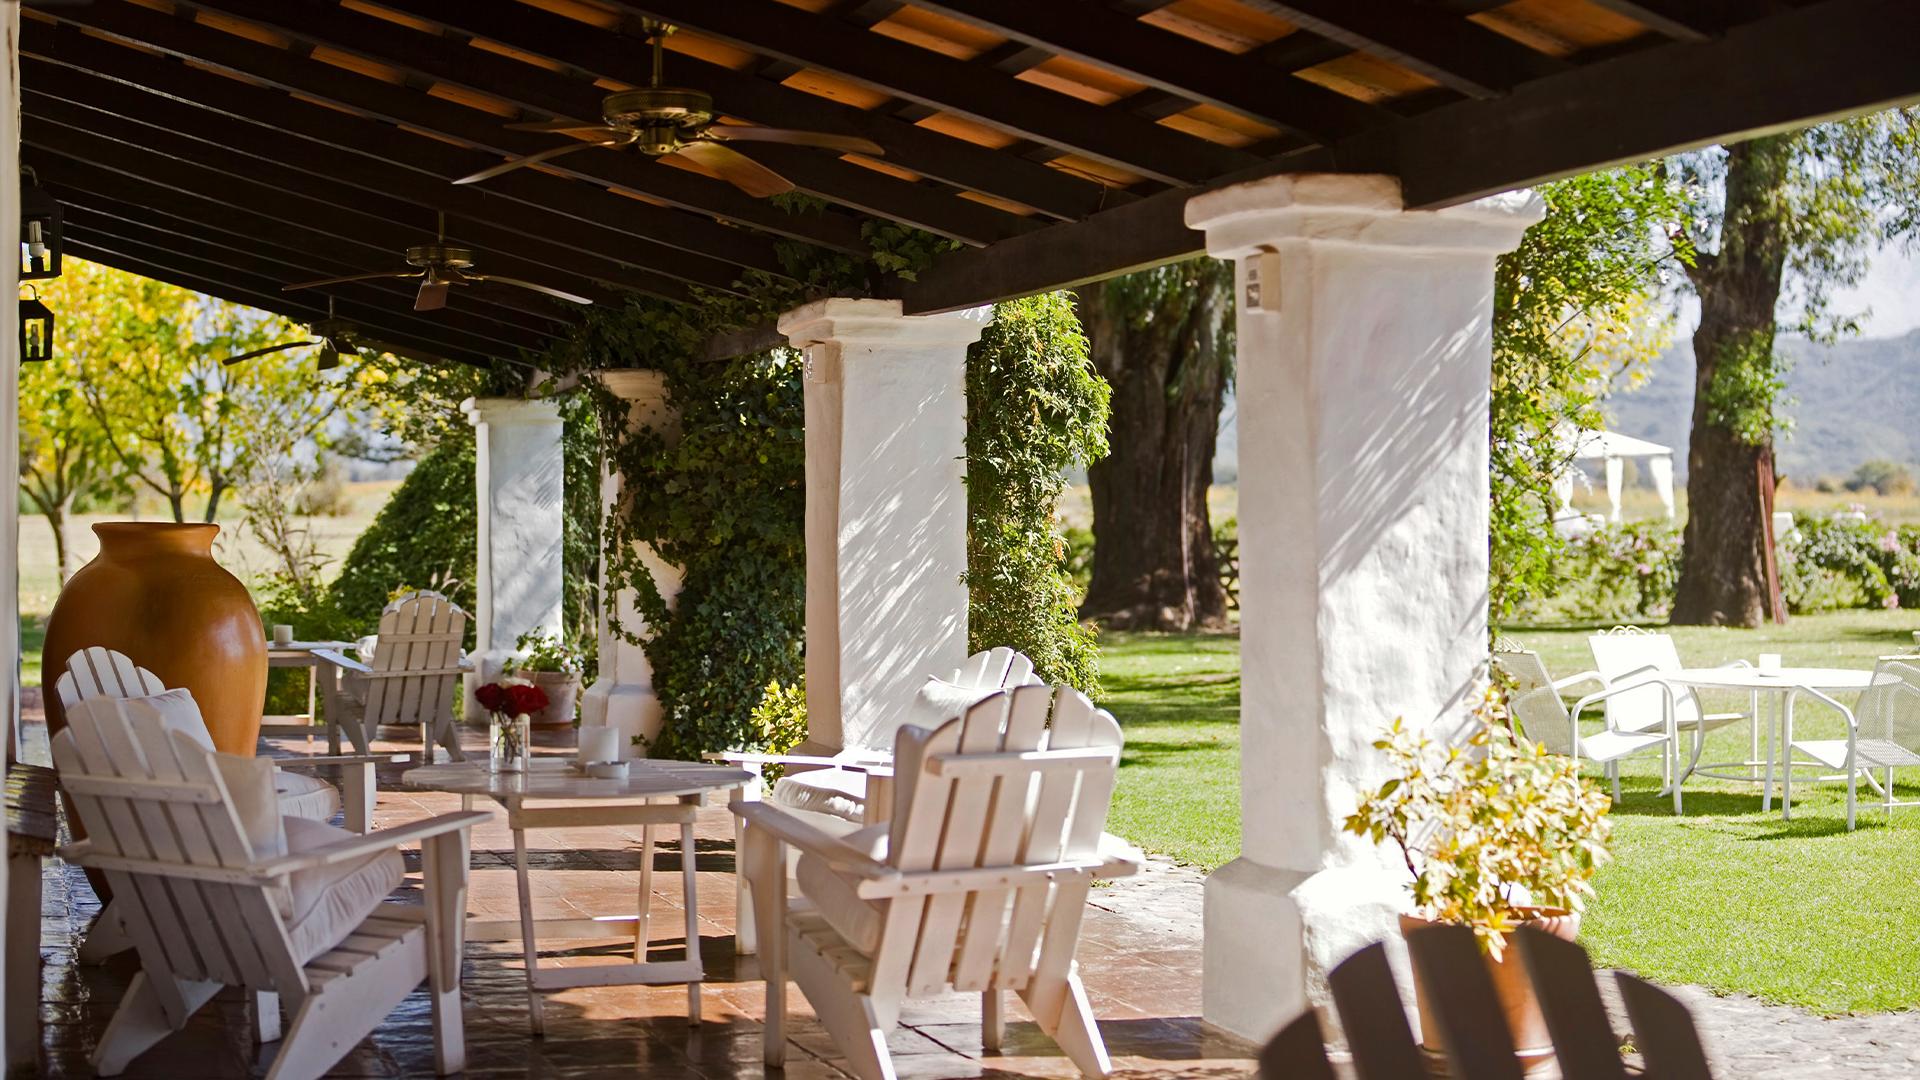 House-of-Jasmines-Salta-Argentina